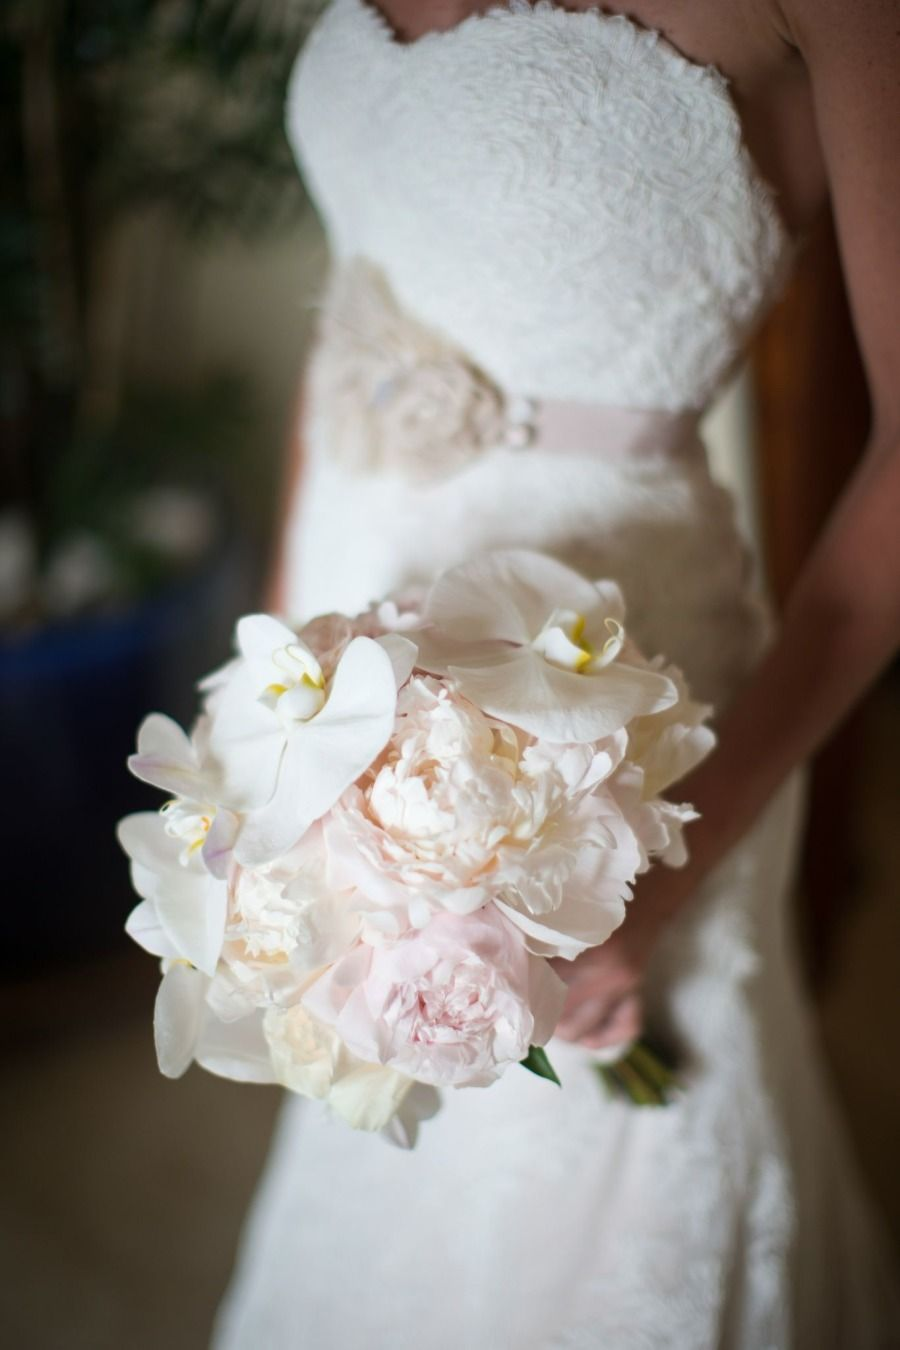 Kona Hawaii Wedding from Toby Hoogs Photography VintageuLace